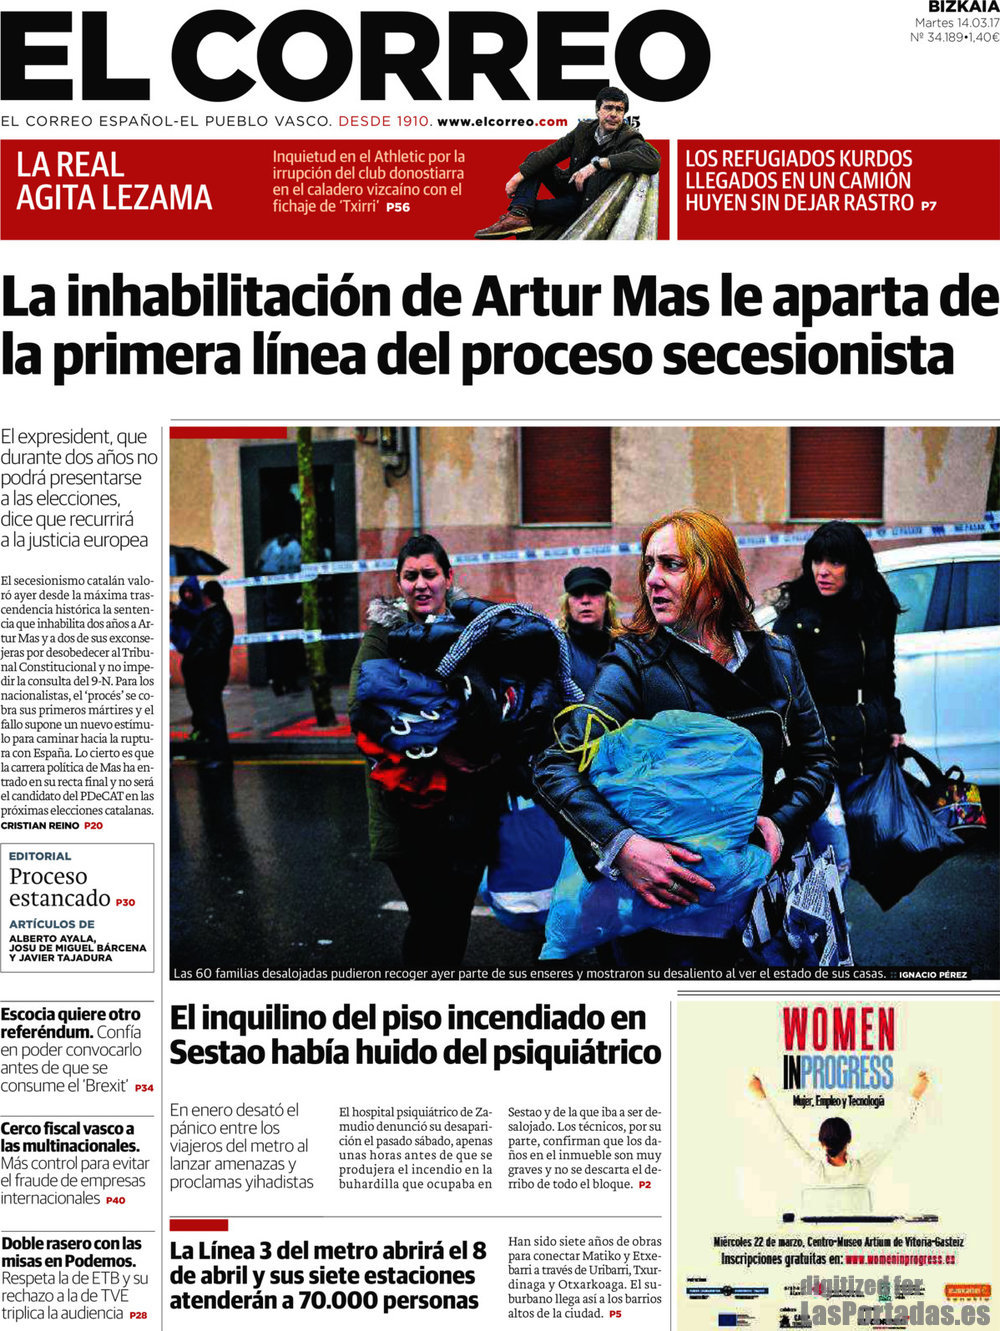 Periodico el correo 14 3 2017 for Correo la 14